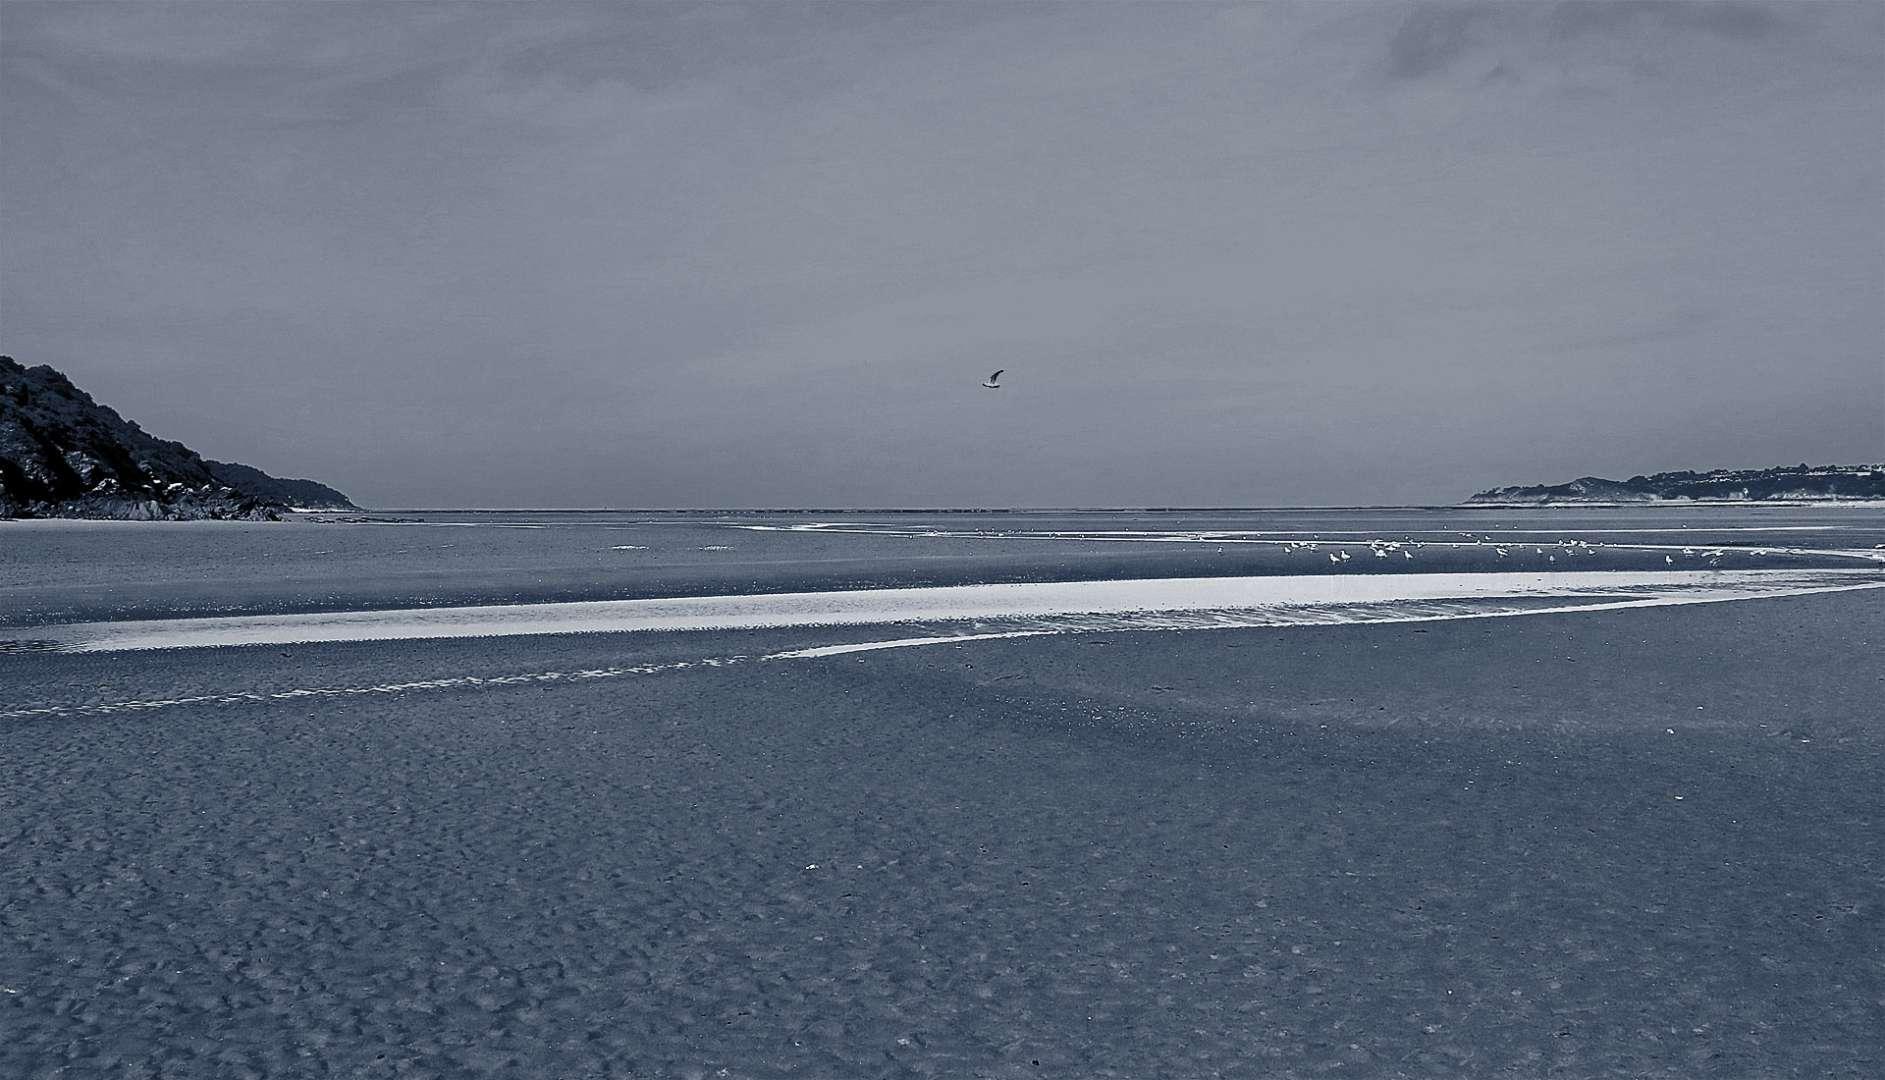 La baie de la Fresnaye